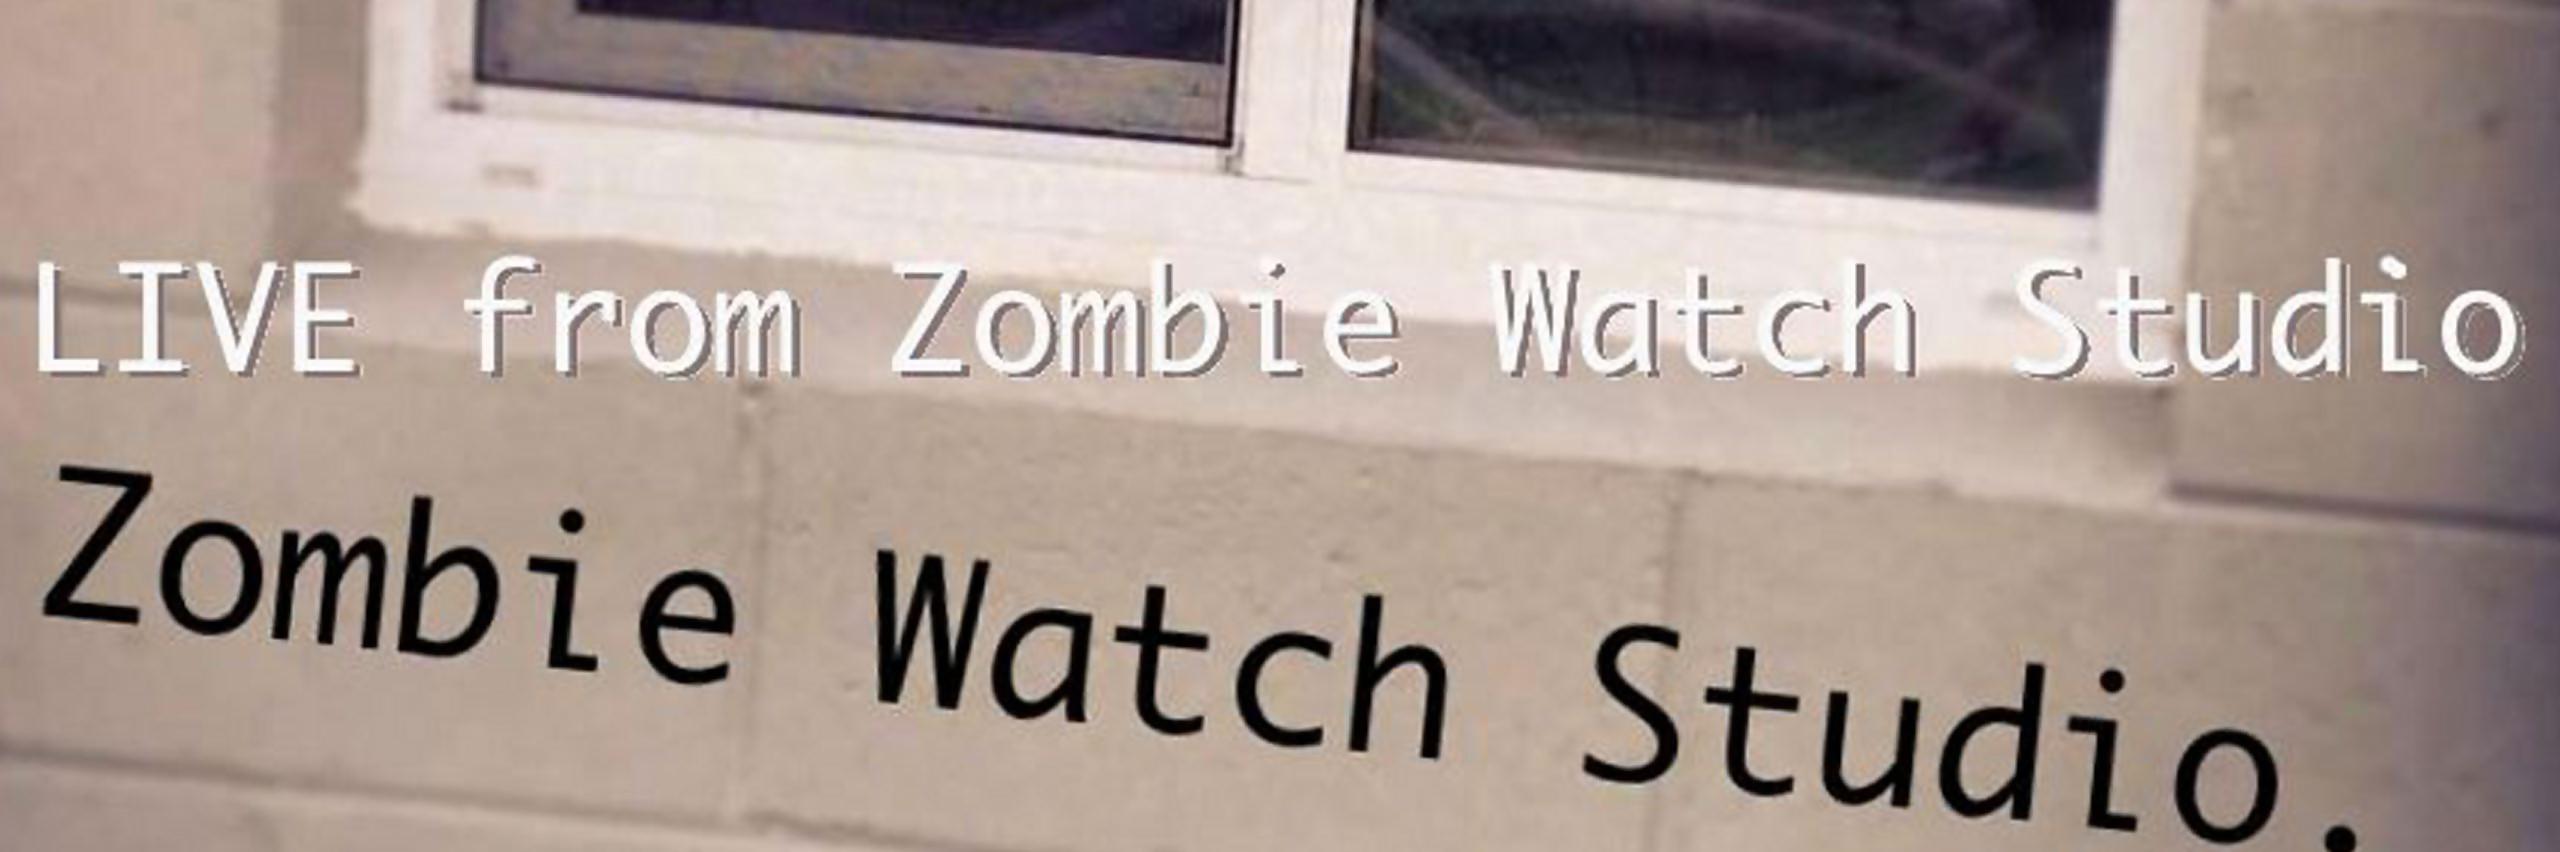 Live from Zombie Watch Studio